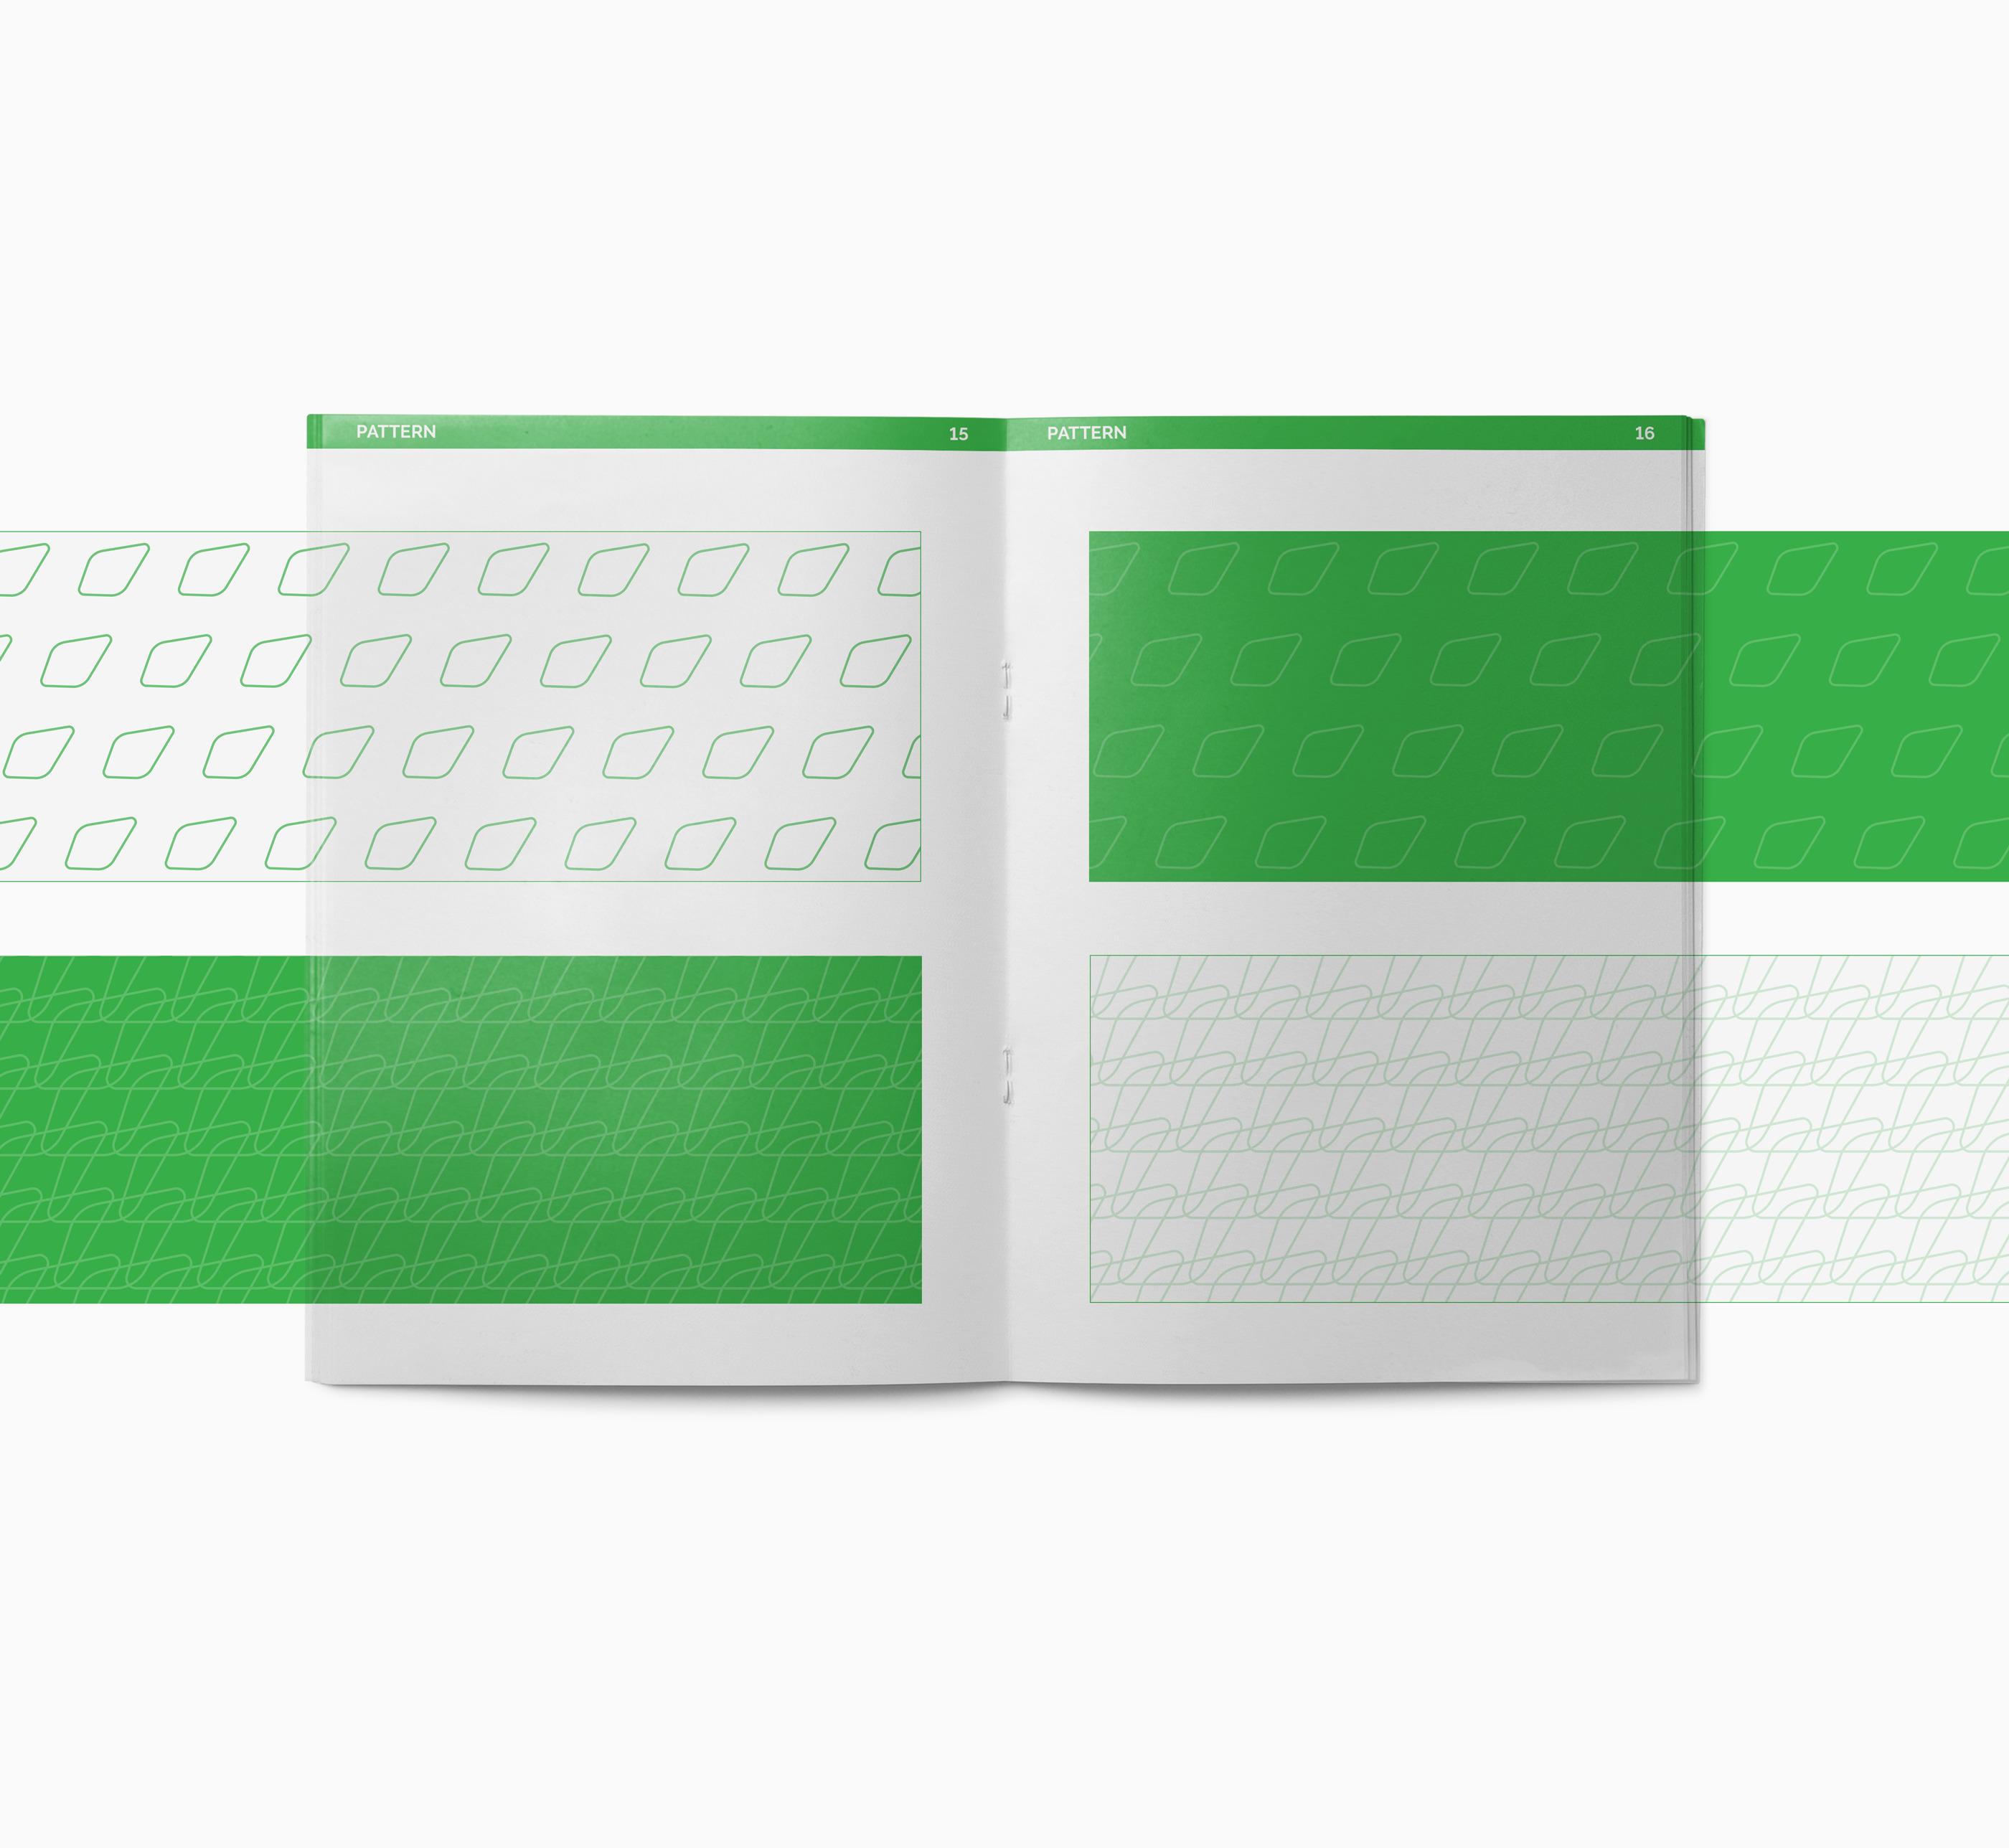 nelio brand pattern